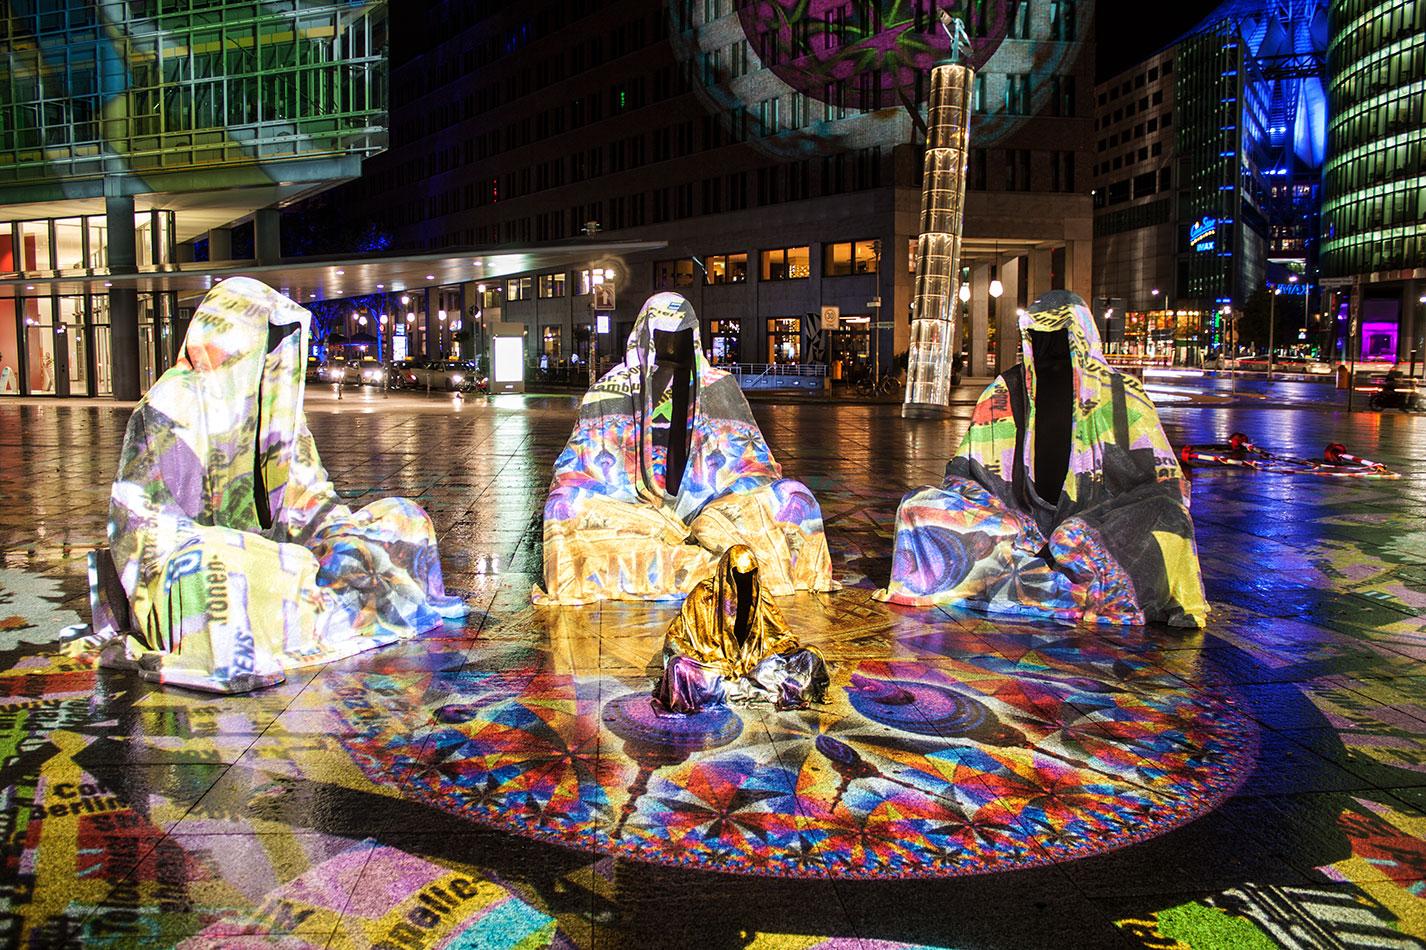 festival-of-lights-berlin-light-art-festival-contemporary-fine-art-design-show-large-scale-sculpture-guardiansof-time-manfred-kili-kielnhofer-sculpture-3873